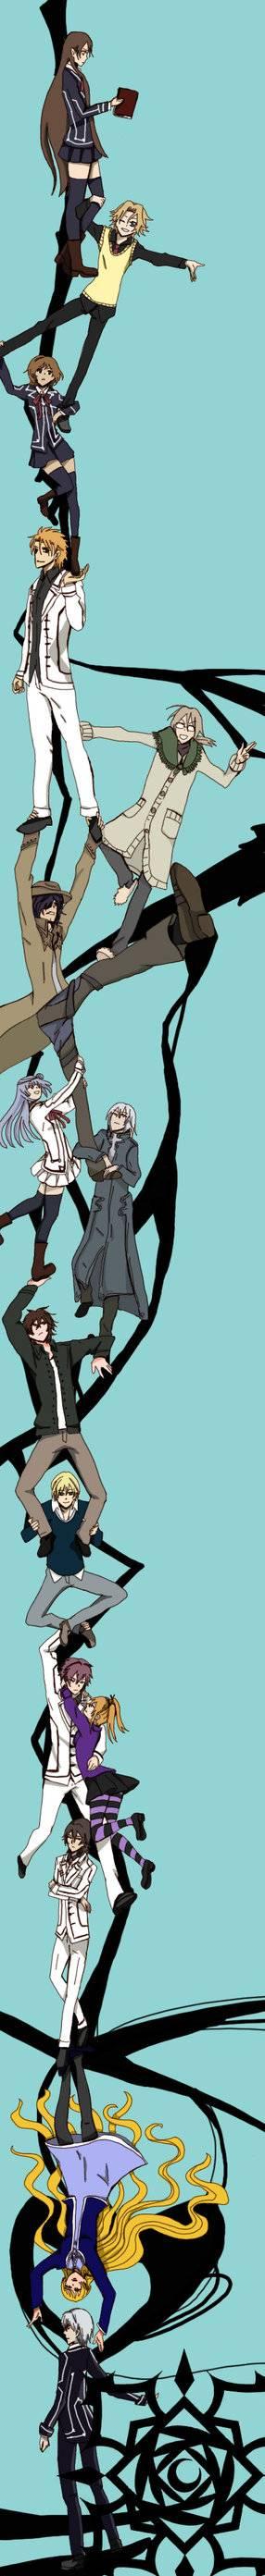 Tags: Anime, Vampire Knight, Shirabuki Sara, Ichijou Takuma, Kurenai Maria, Kaien Cross, Yuki Cross, Kiryuu Ichiru, Aidou Hanabusa, Kiryuu Zero, Toga Yagari, Takamiya Kaito, Shiki Senri